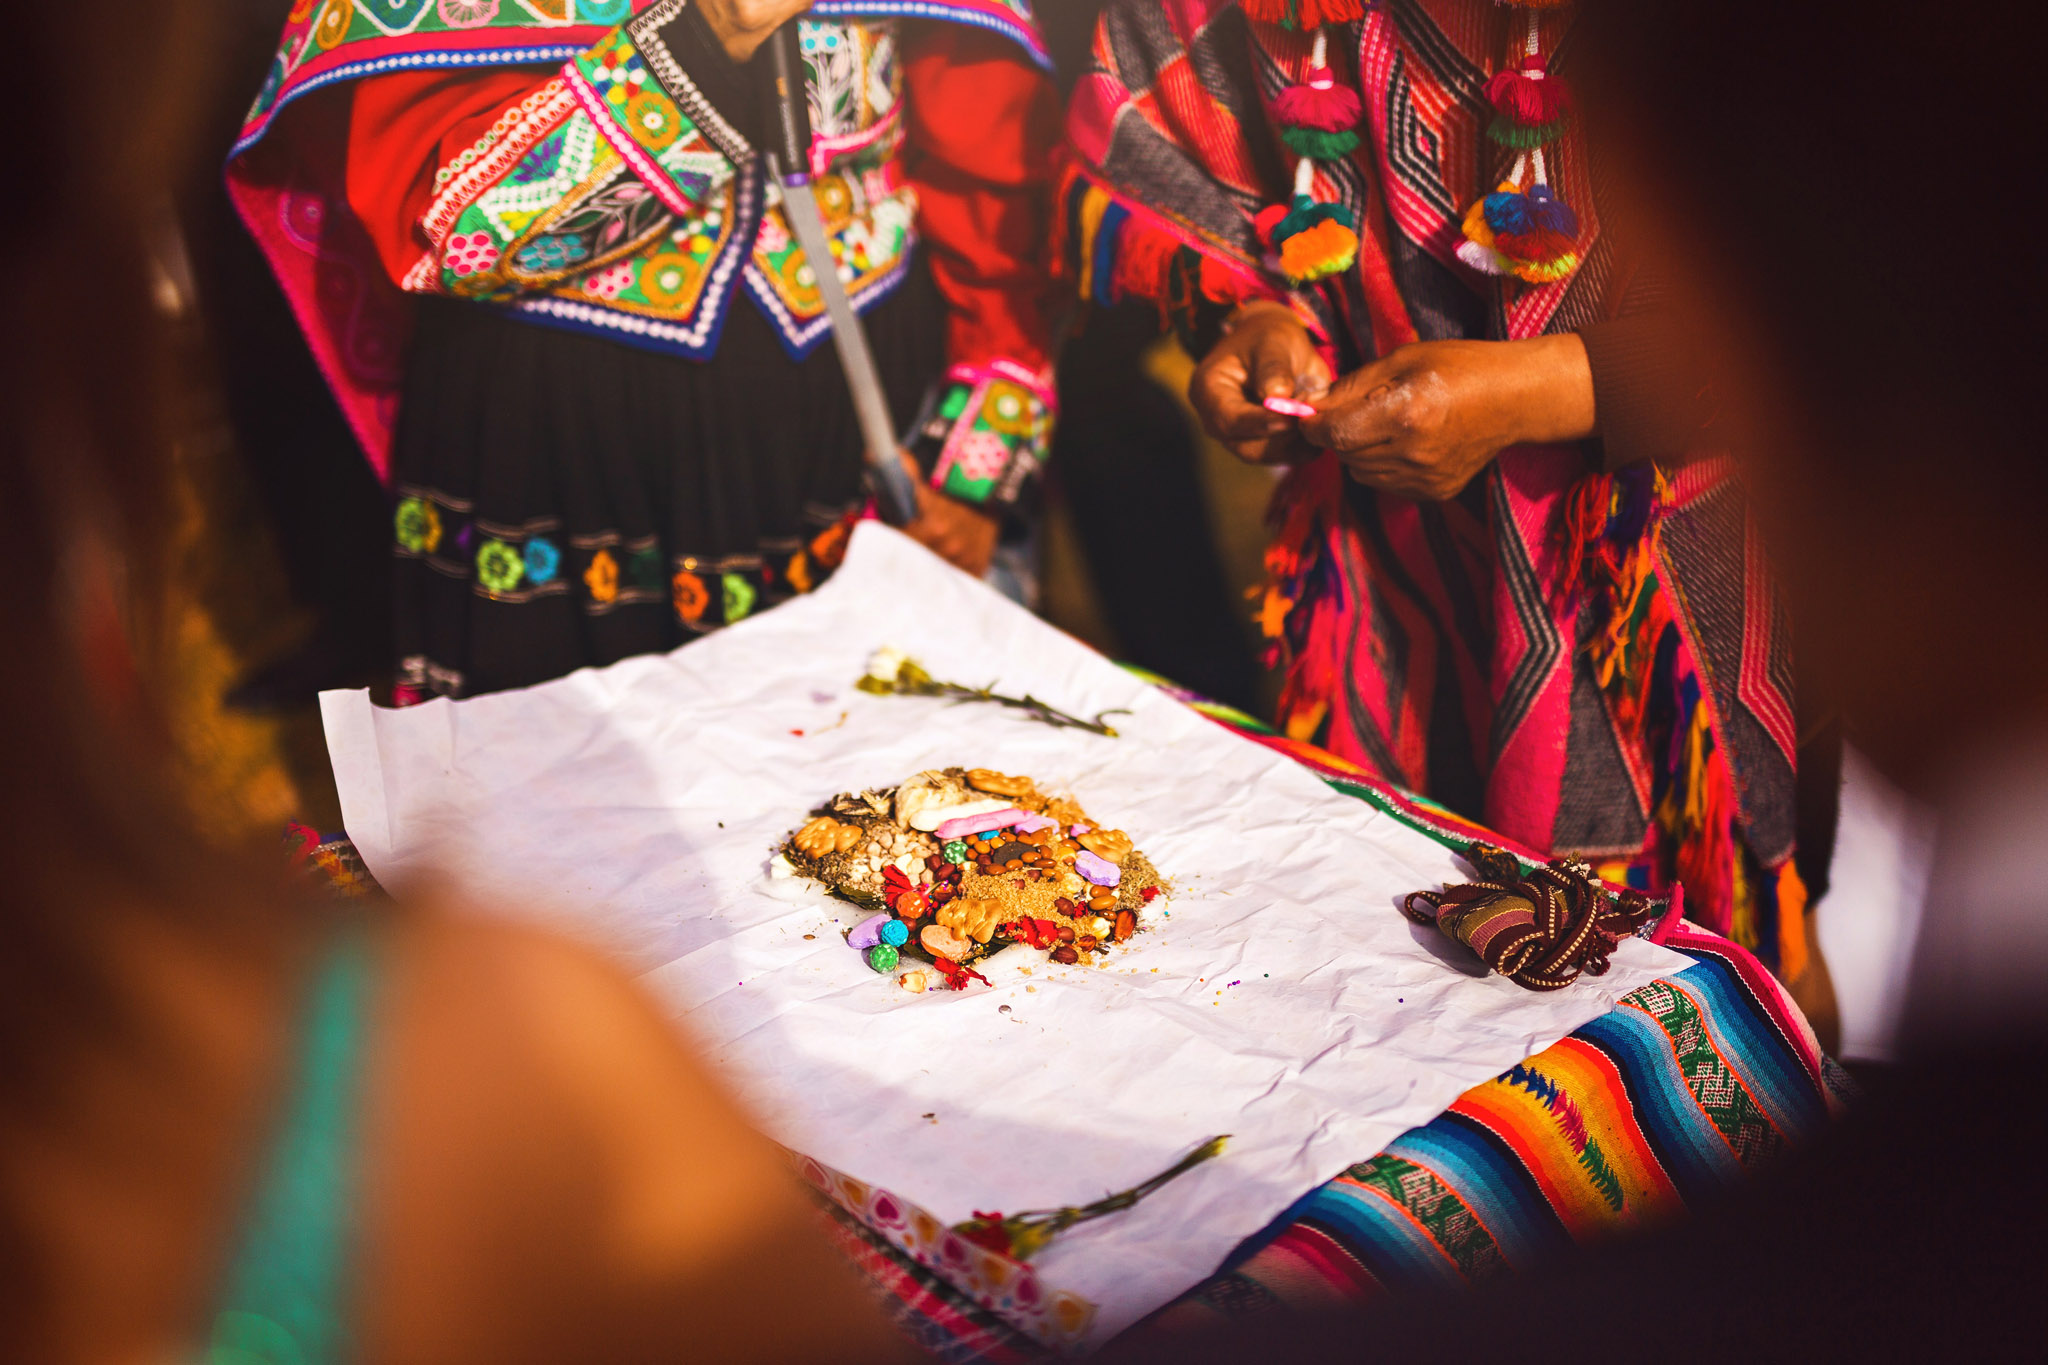 Wedding-Travellers-Destination-Wedding-Peru-Cusco-Hacienda-Sarapampa-Sacred-Valley-traditional-andean-ceremony-preparing-despacho-offer-mother-earth-pachamama